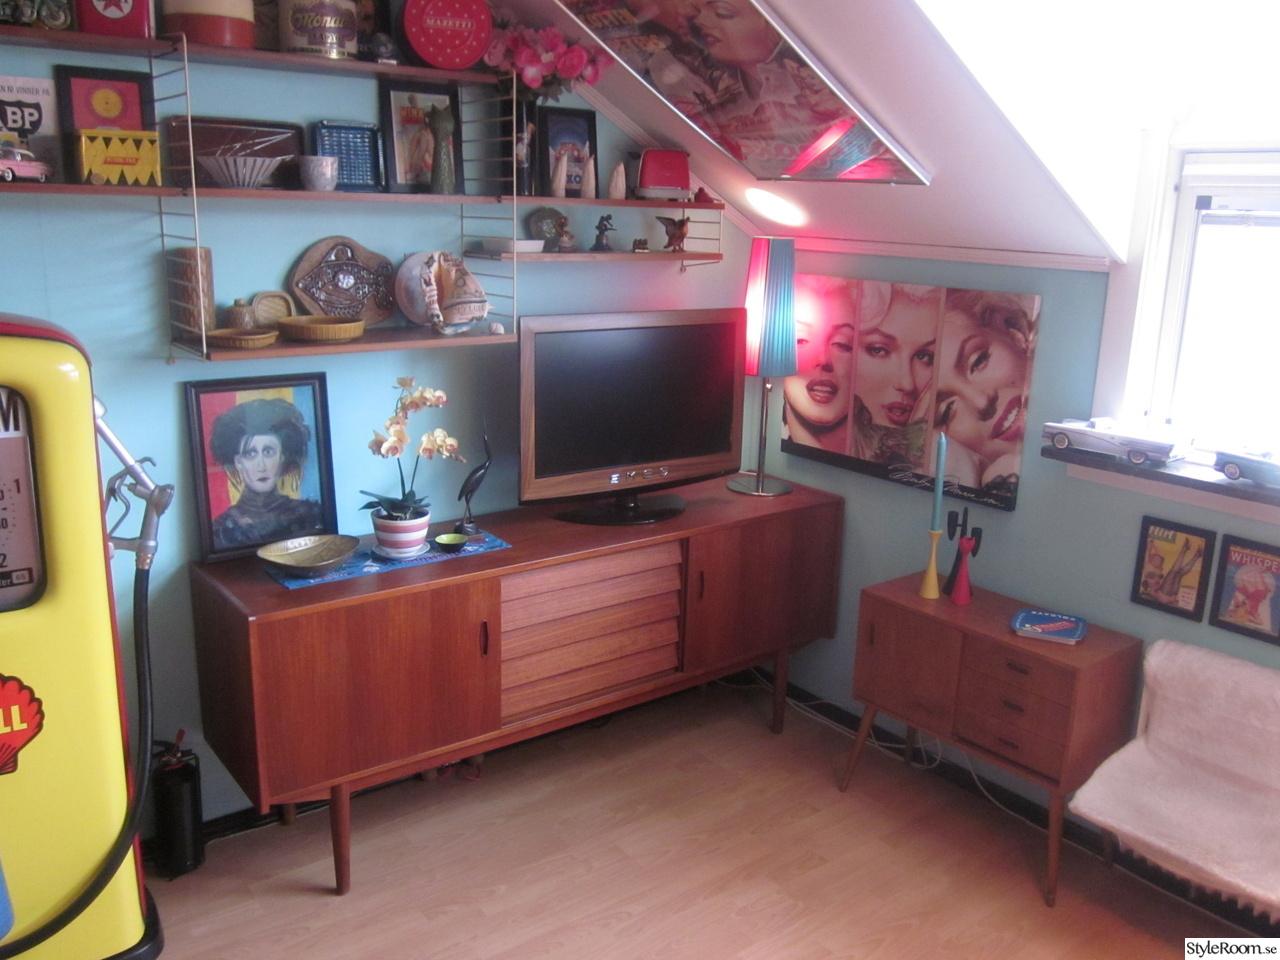 50-tal,retro,nostalgi,teak,sideboard,stringhylla,tv,turkost,rött ...